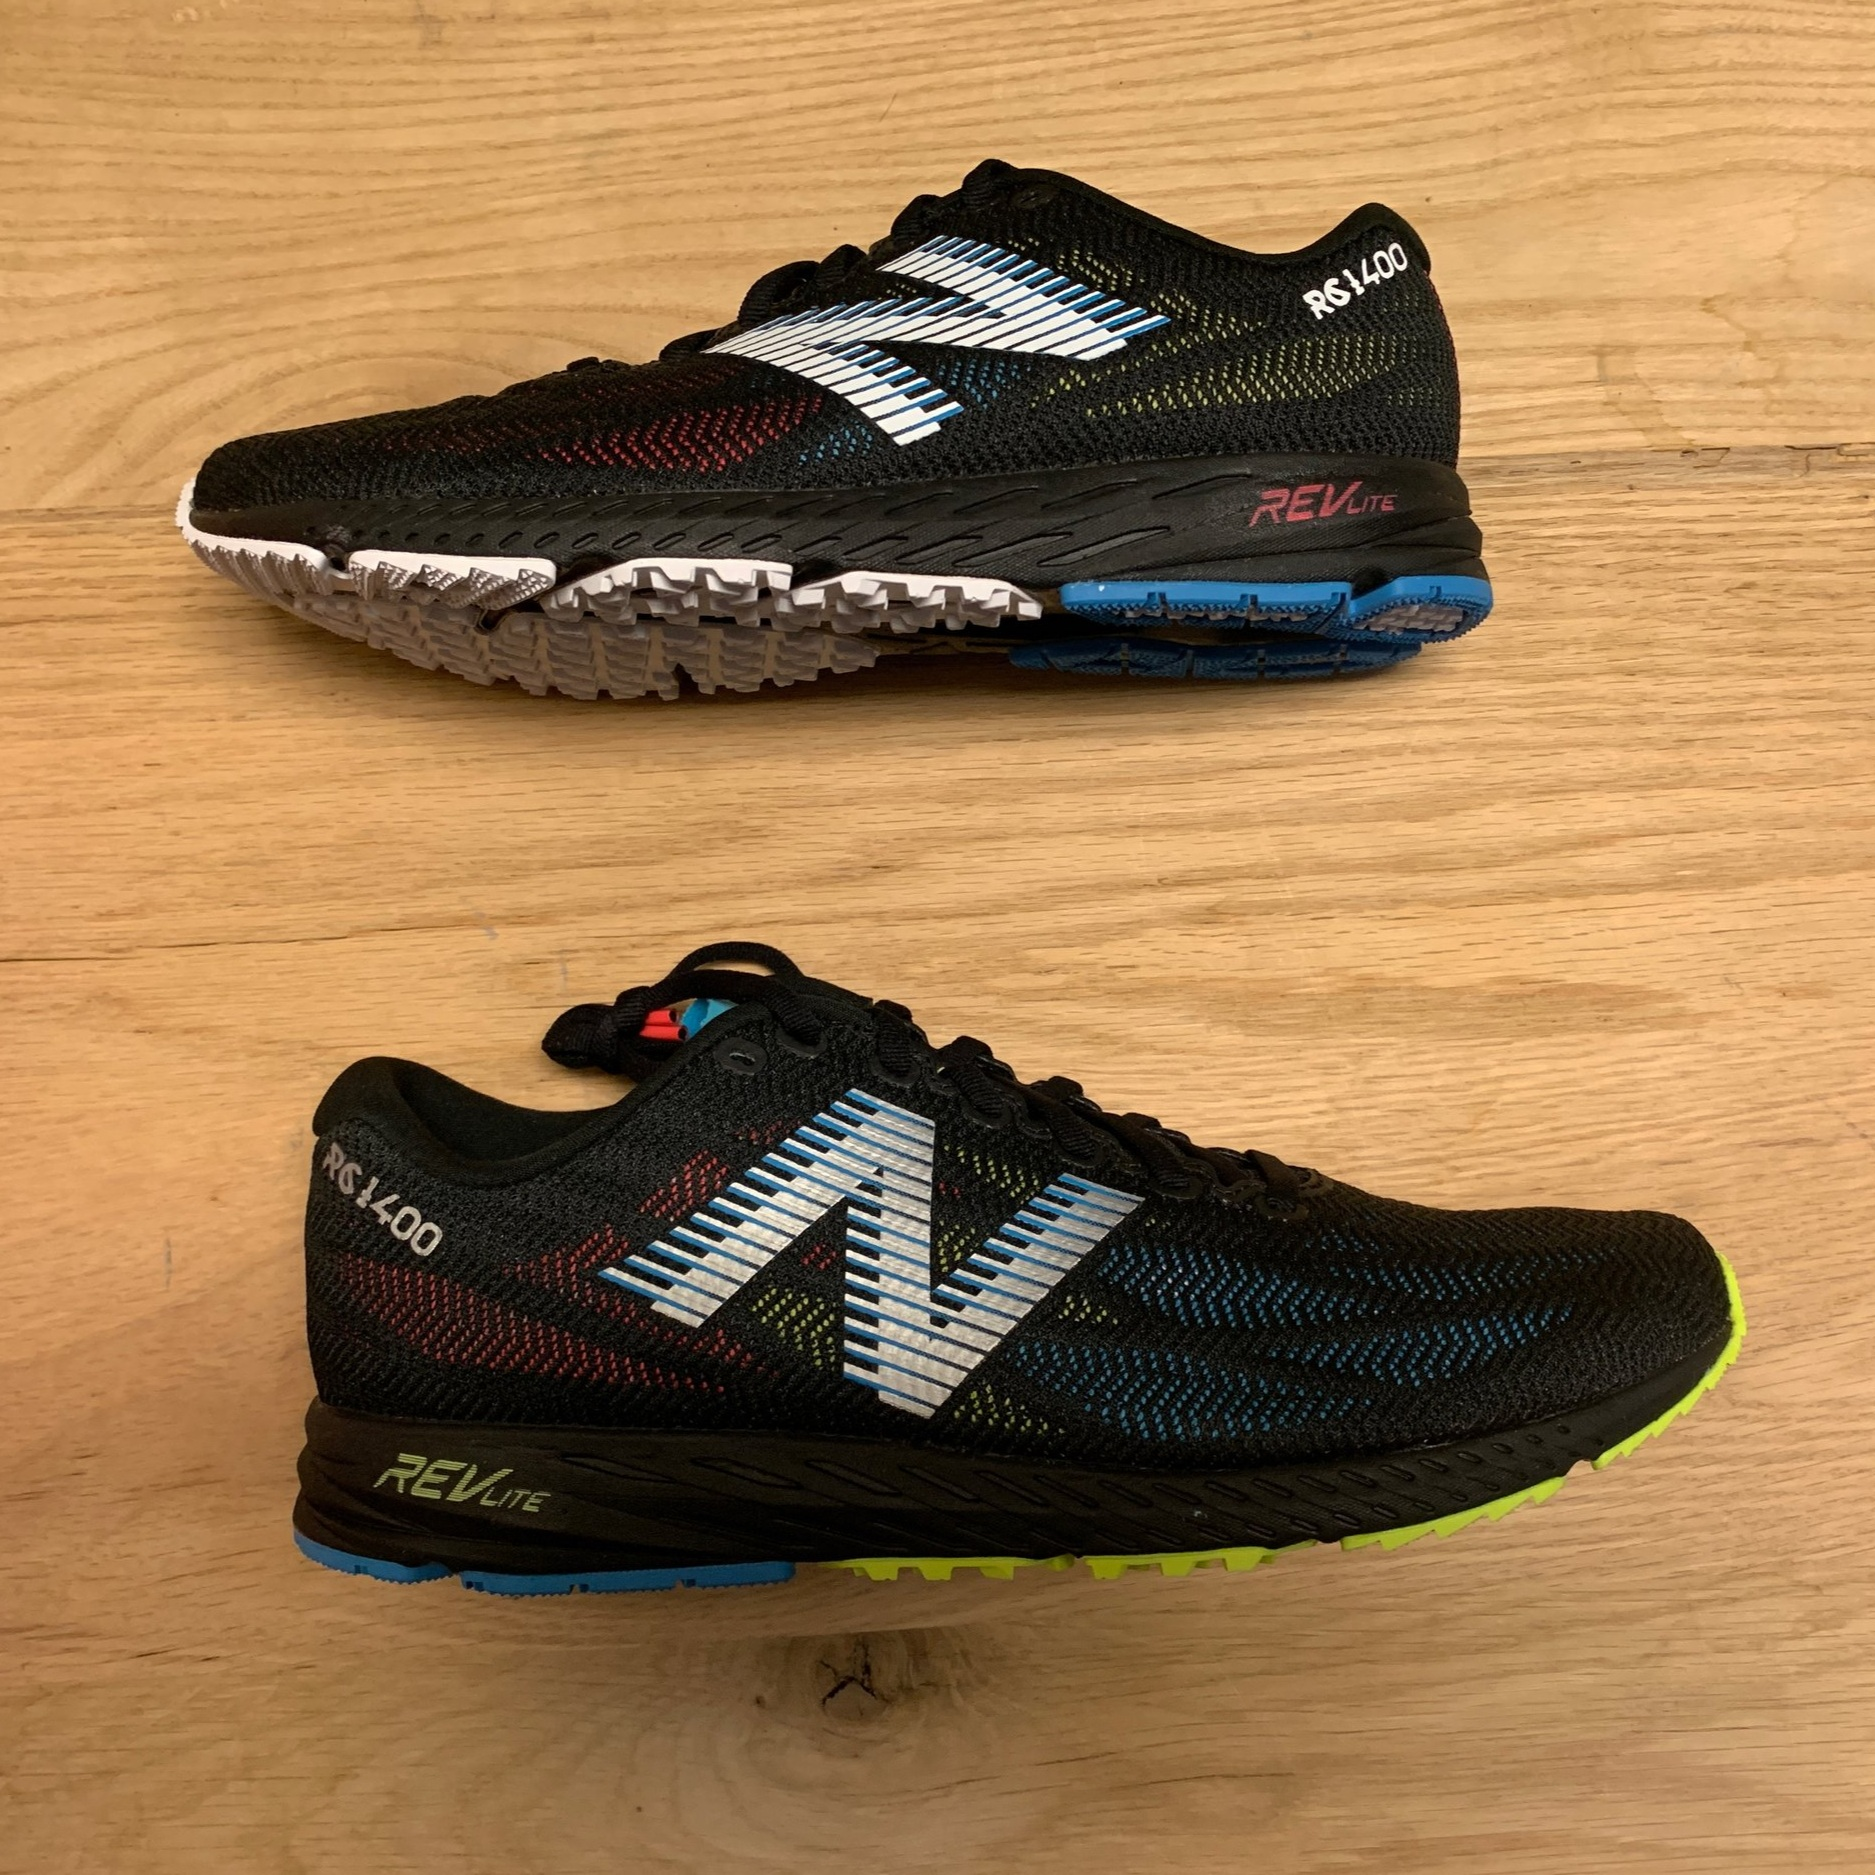 New Balance 1400v6